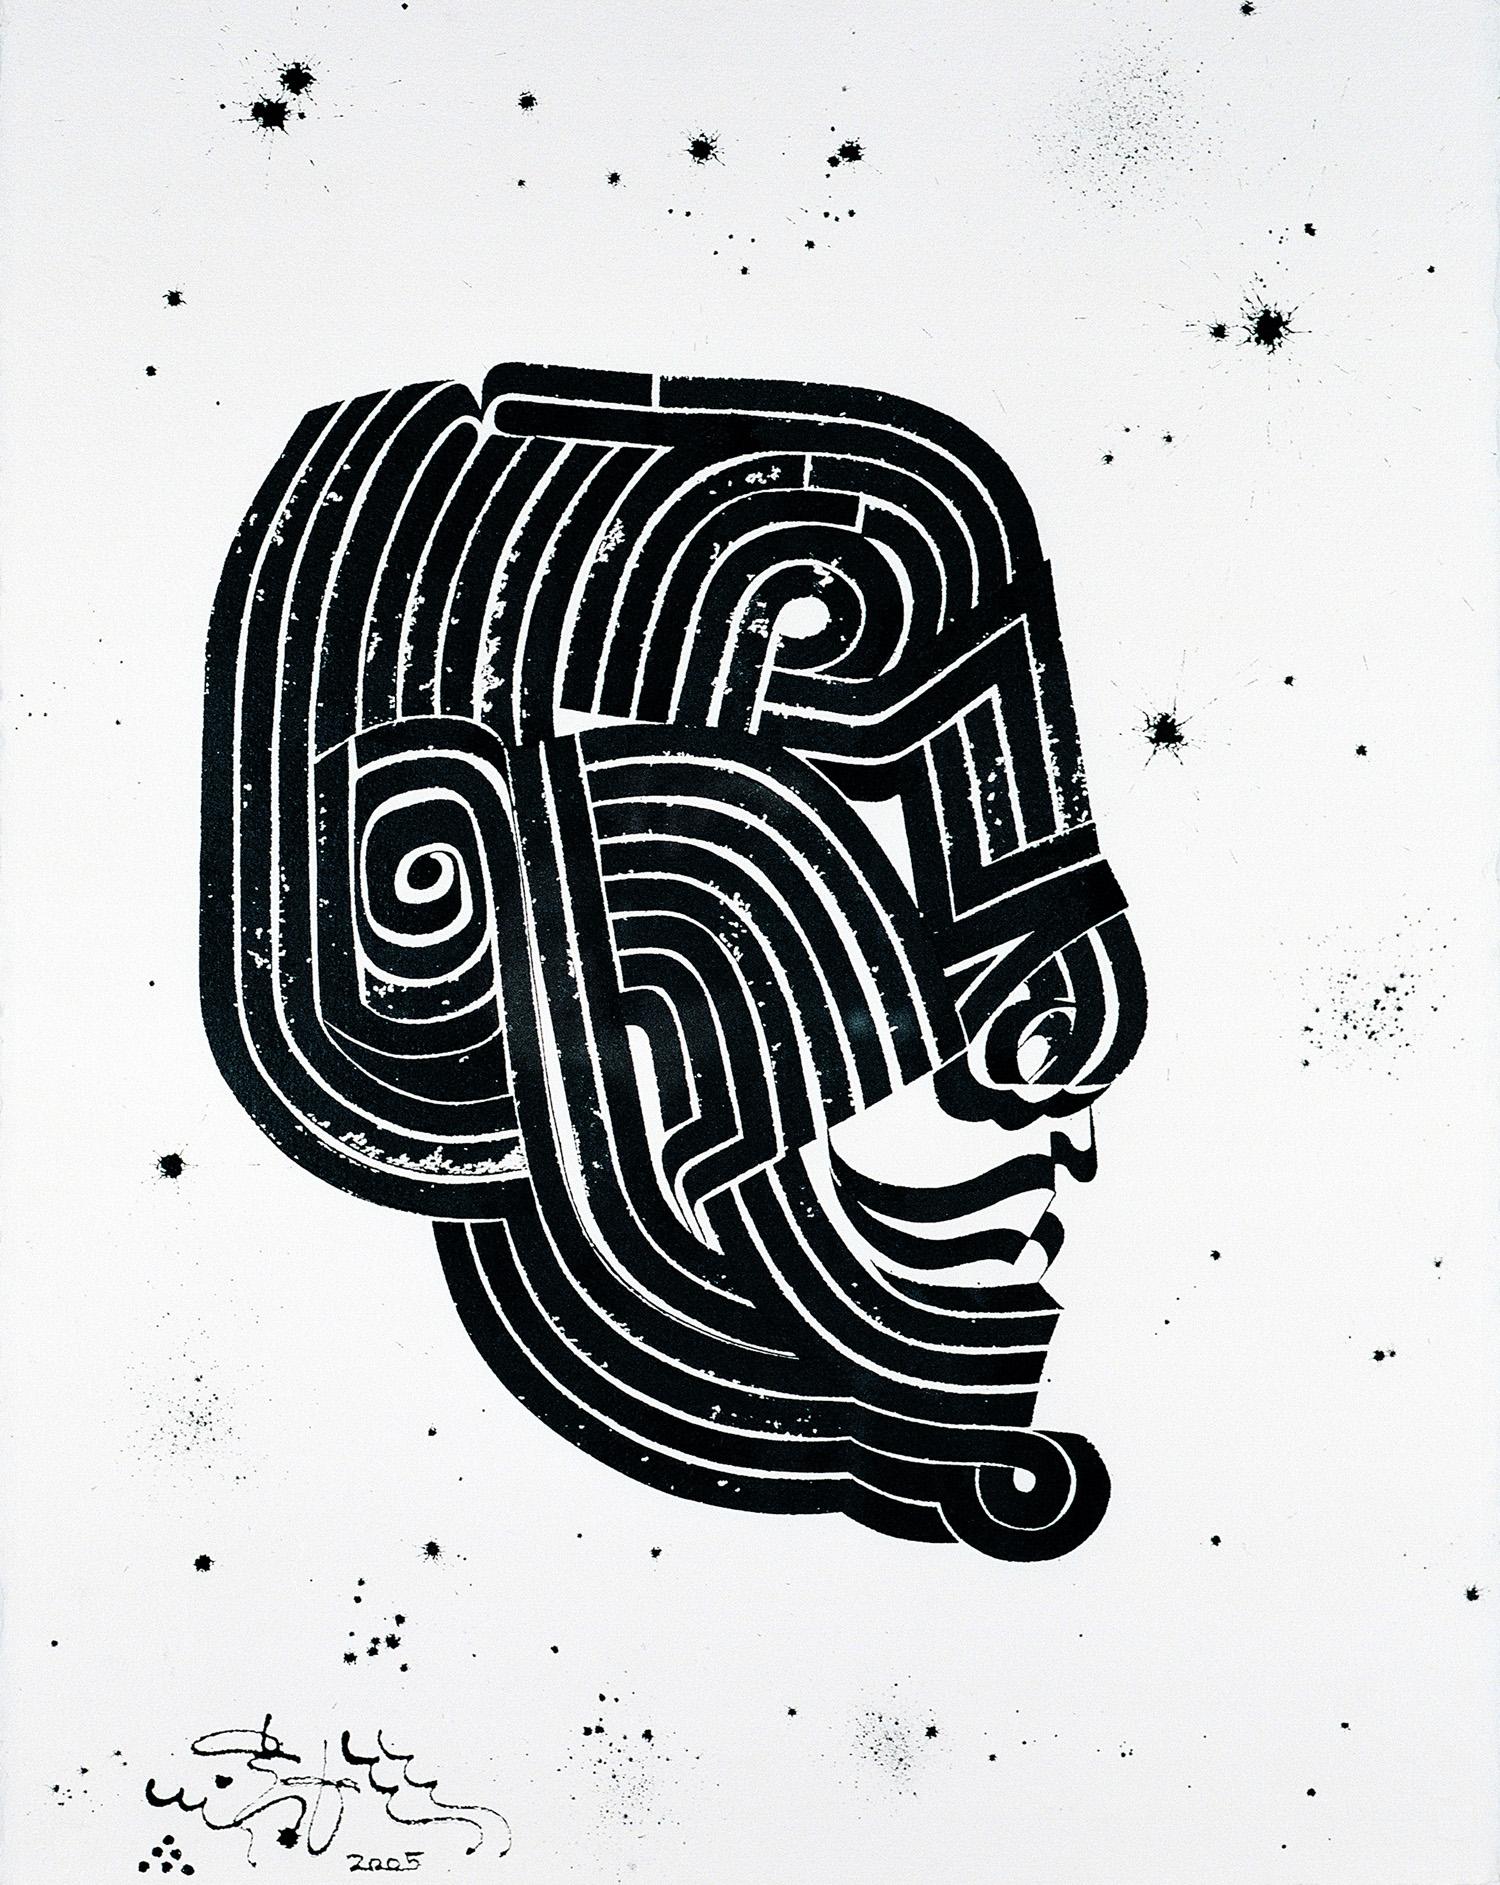 Headmaster I, 2005 sumi ink on handmade paper 30 x 22 inch